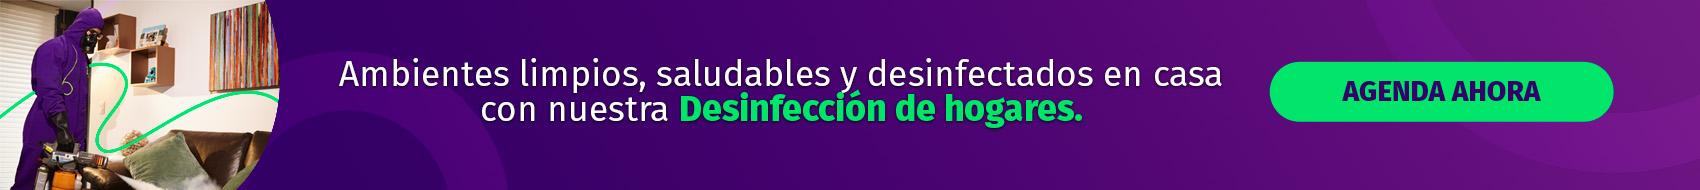 Desinfeccion-de-hogares-2-DESKTOP